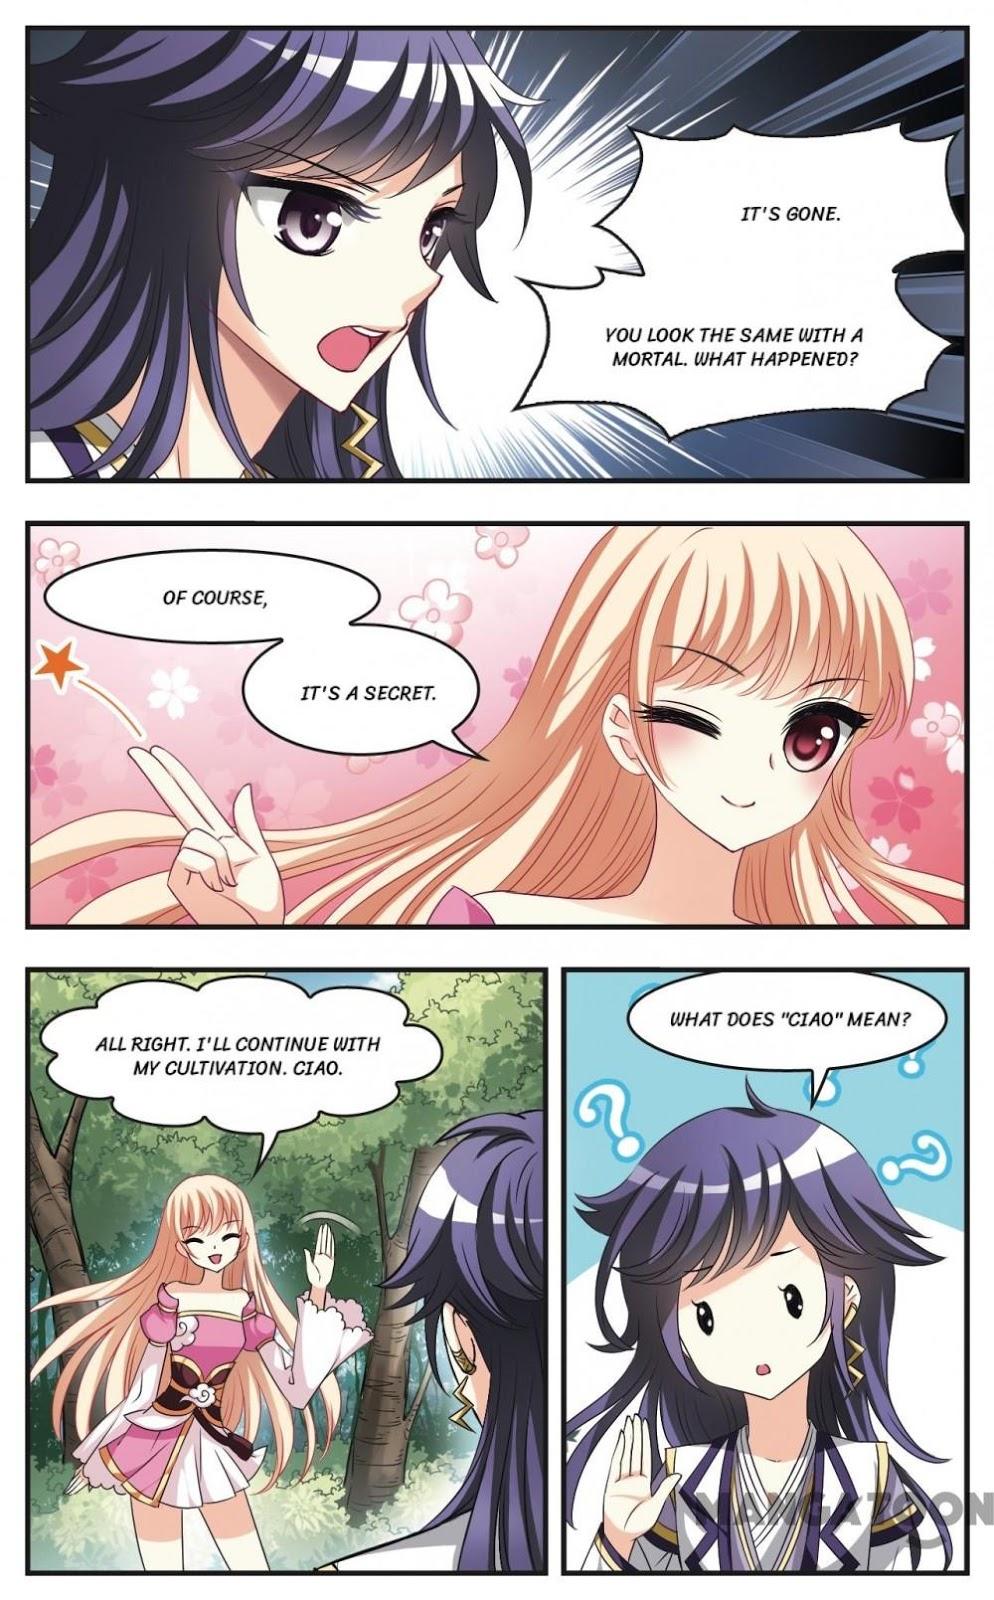 The World of Canglan Chapter 57 - Manga Romance